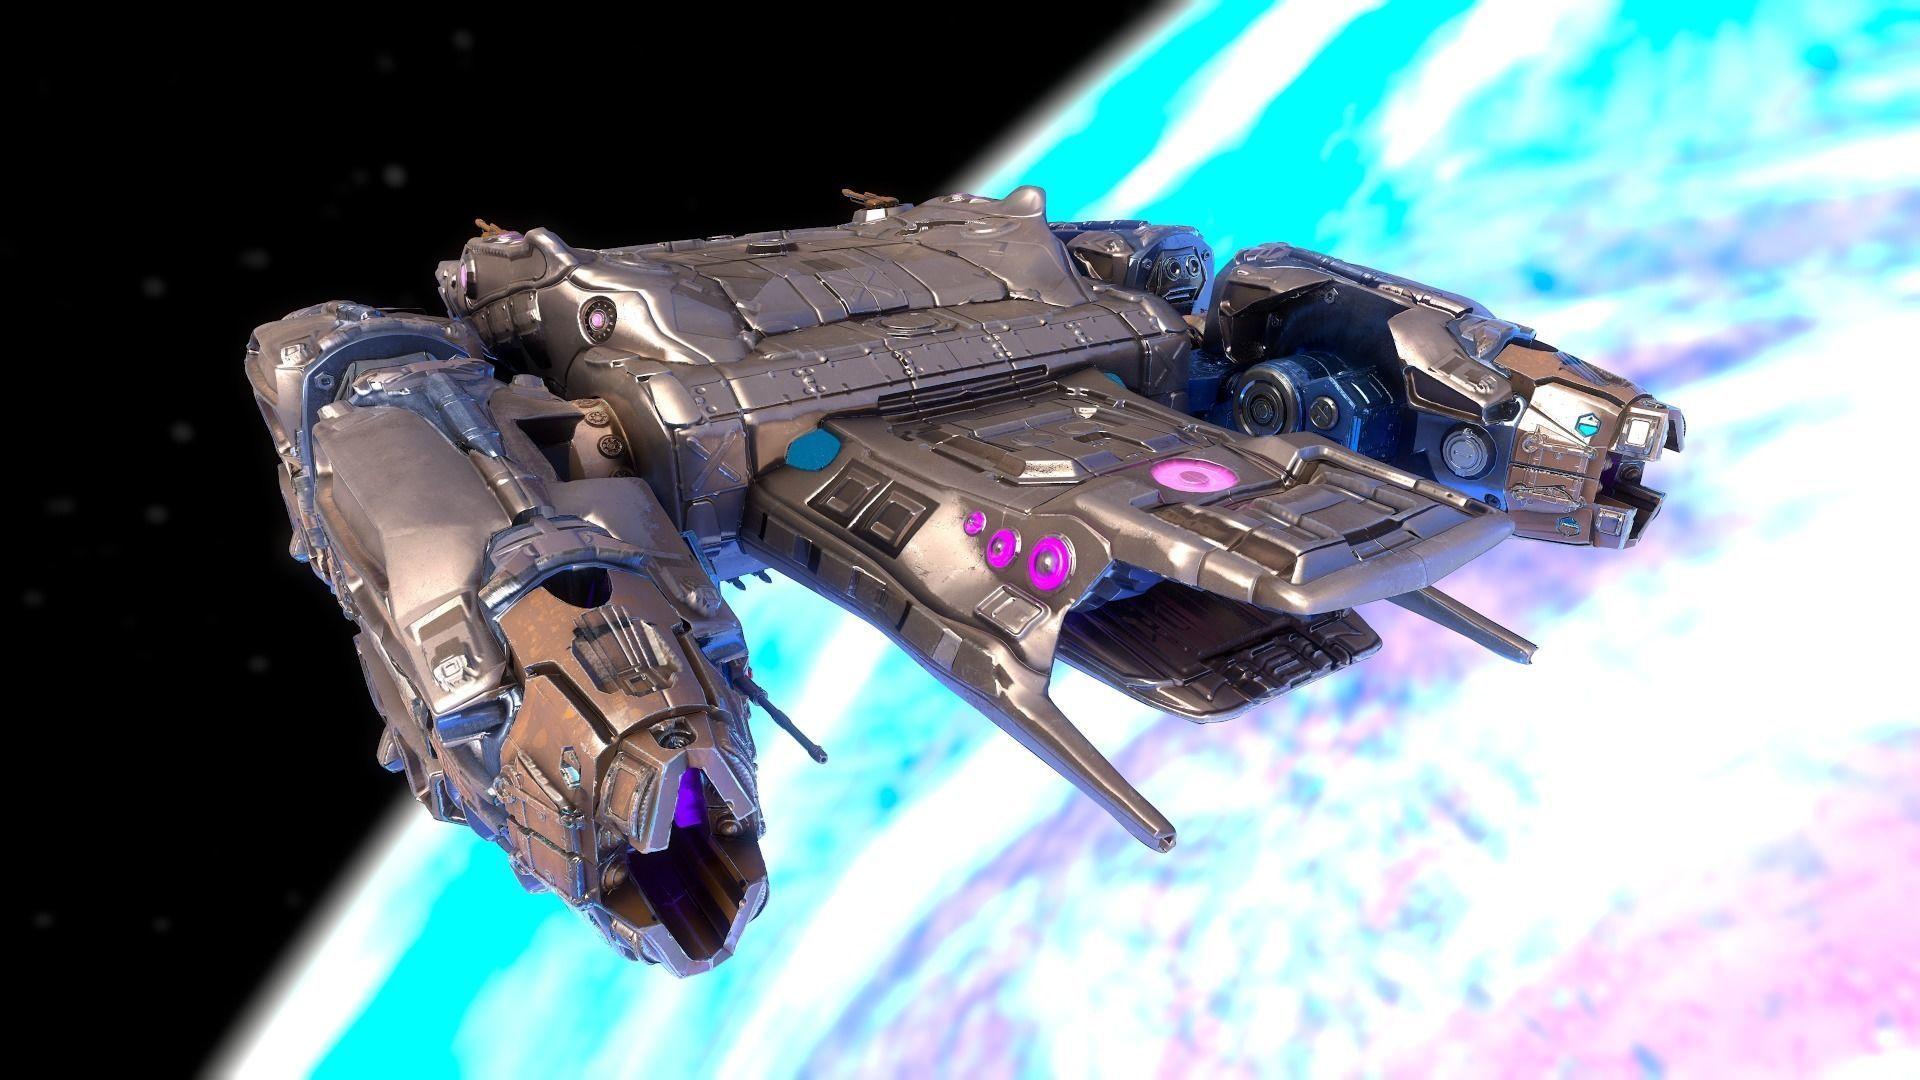 Sci-fi Battle Spaceship Essenor-Rigged